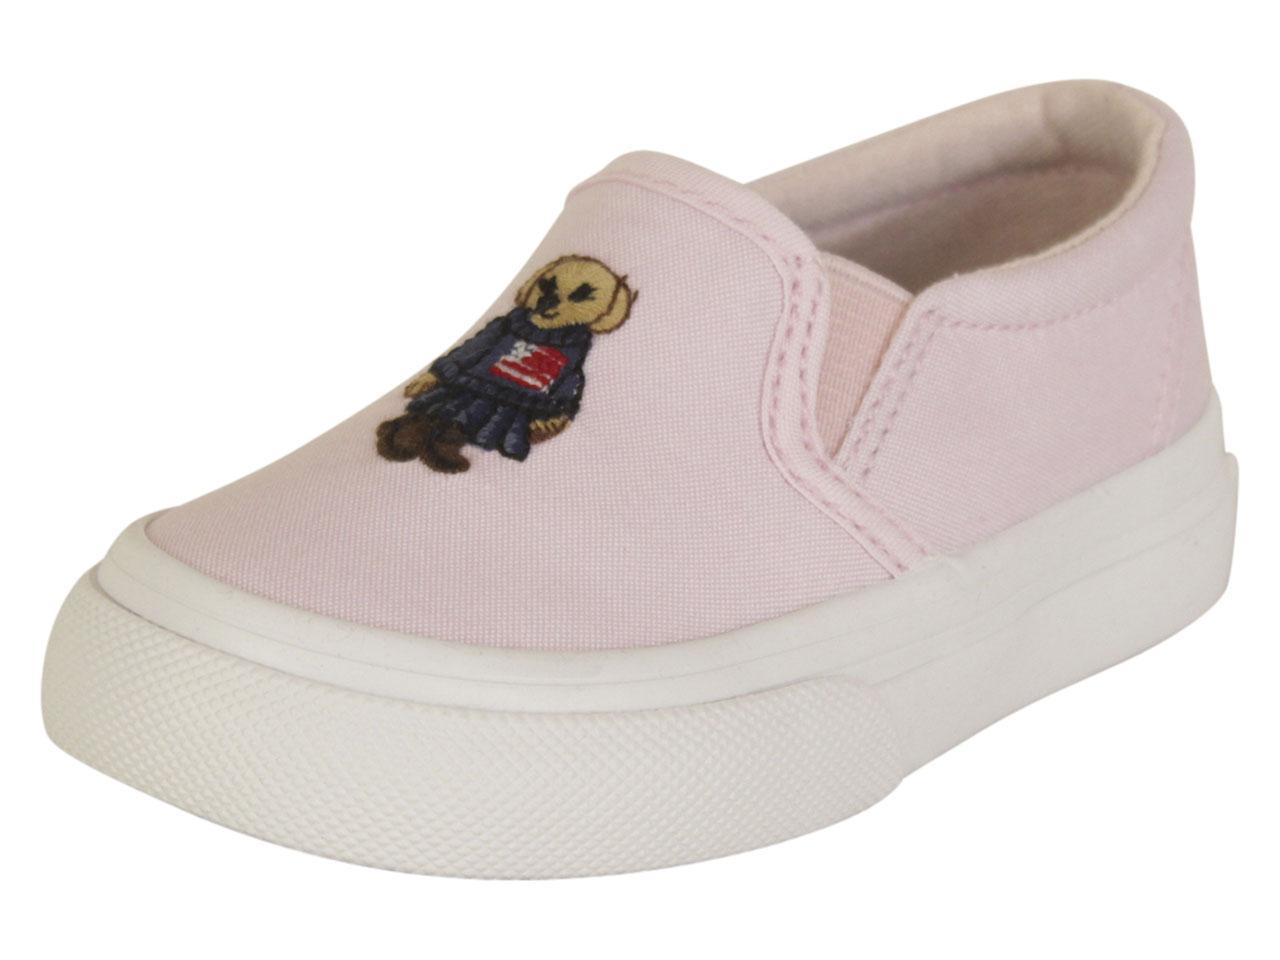 d9712bc66 Polo Ralph Lauren Toddler Girl s Carlee Bear Light Pink Sneakers ...